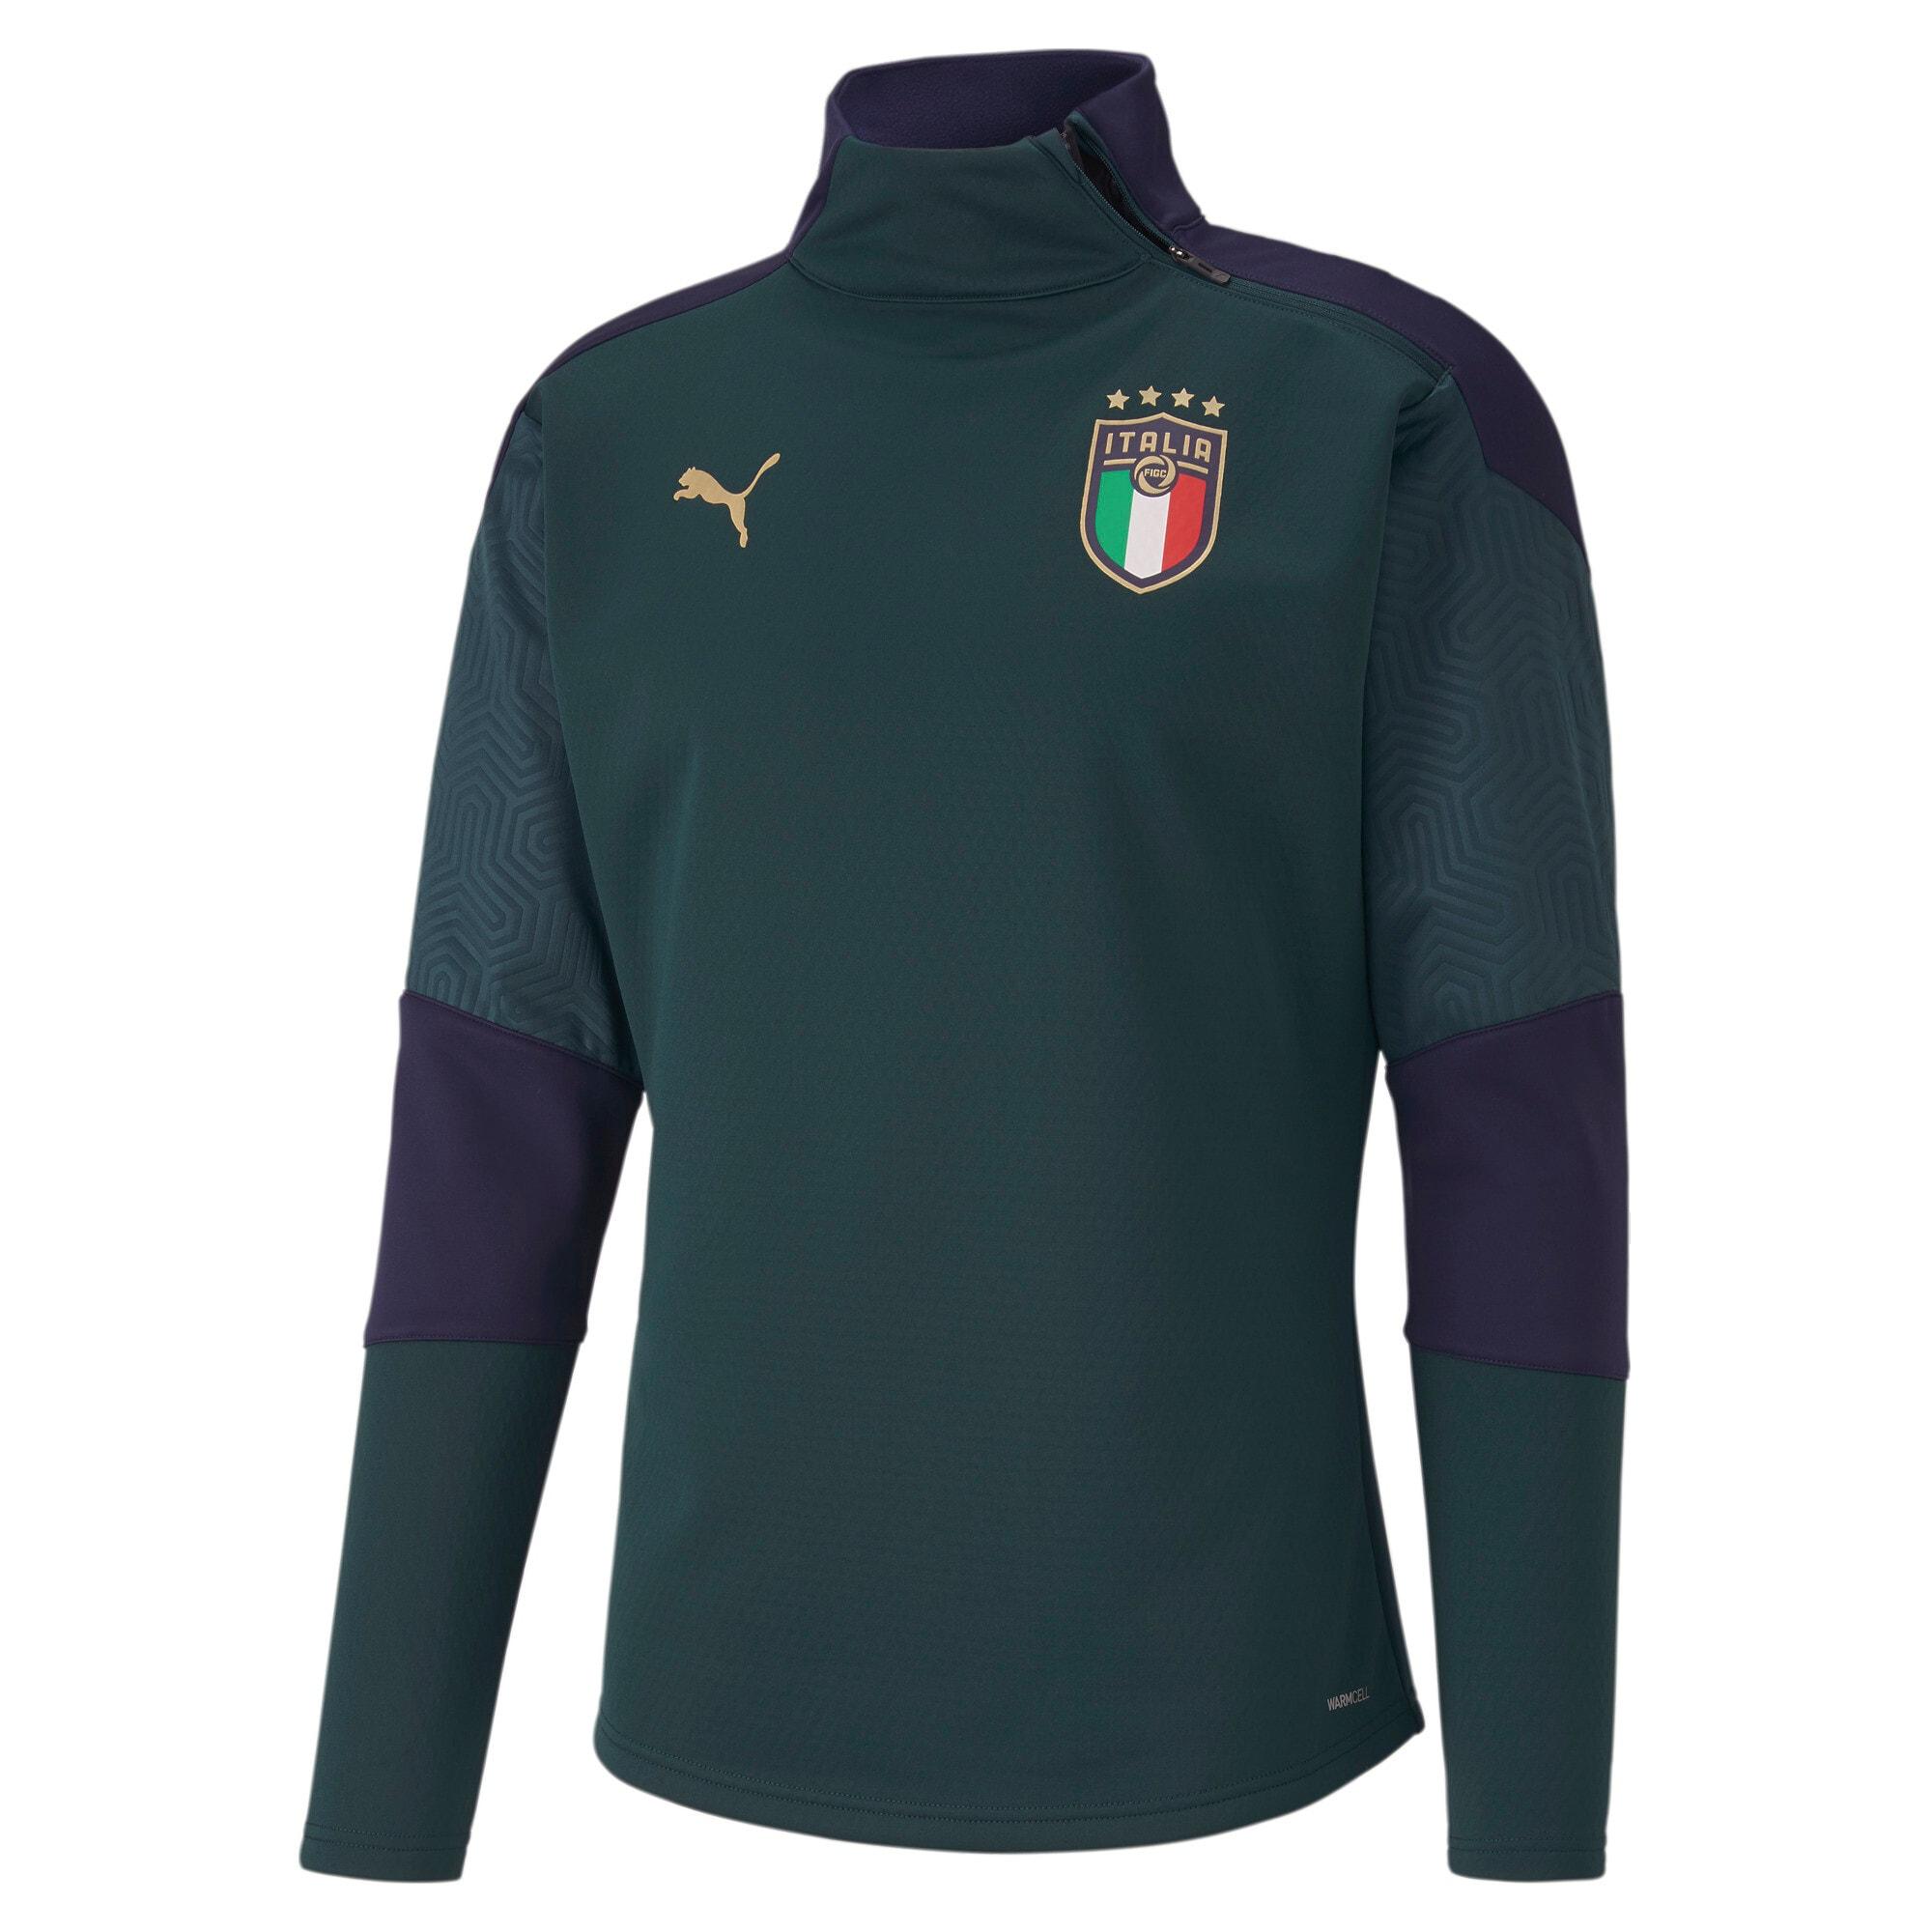 Thumbnail 1 of FIGC Men's Training Fleece, Ponderosa Pine-Peacoat, medium